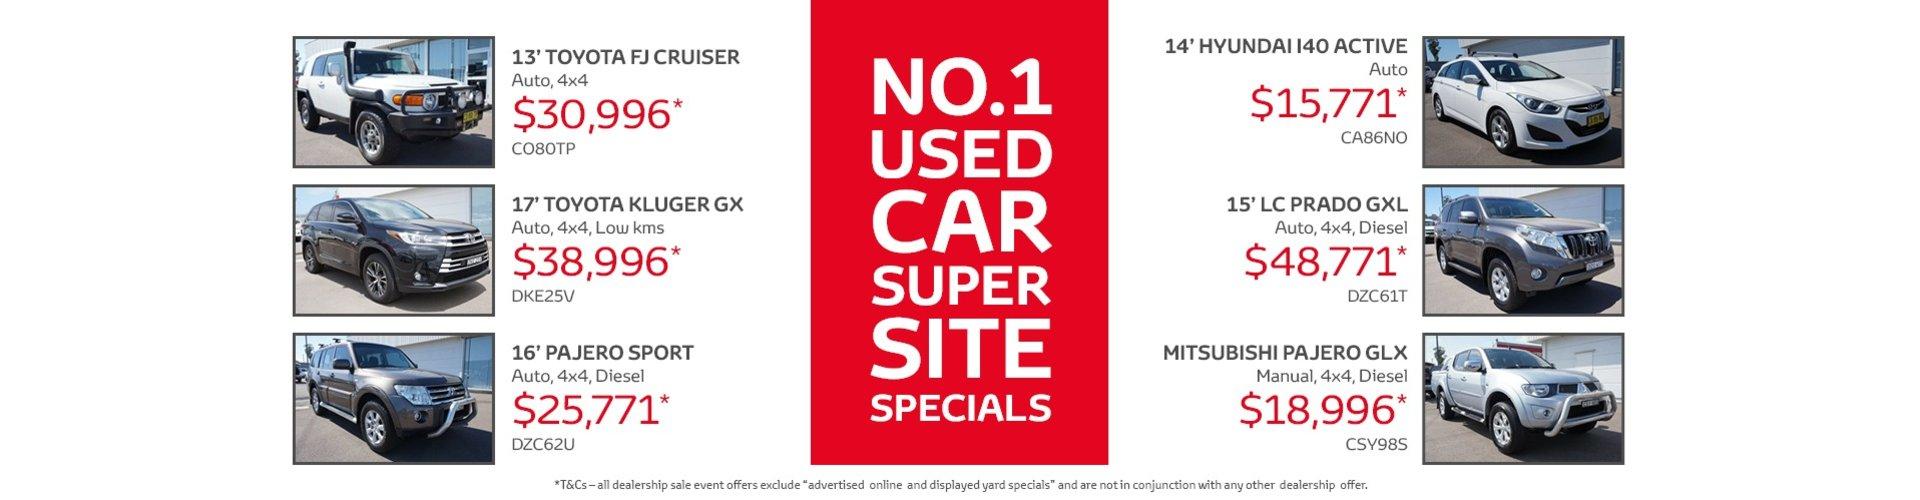 cardiff toyota used car super site